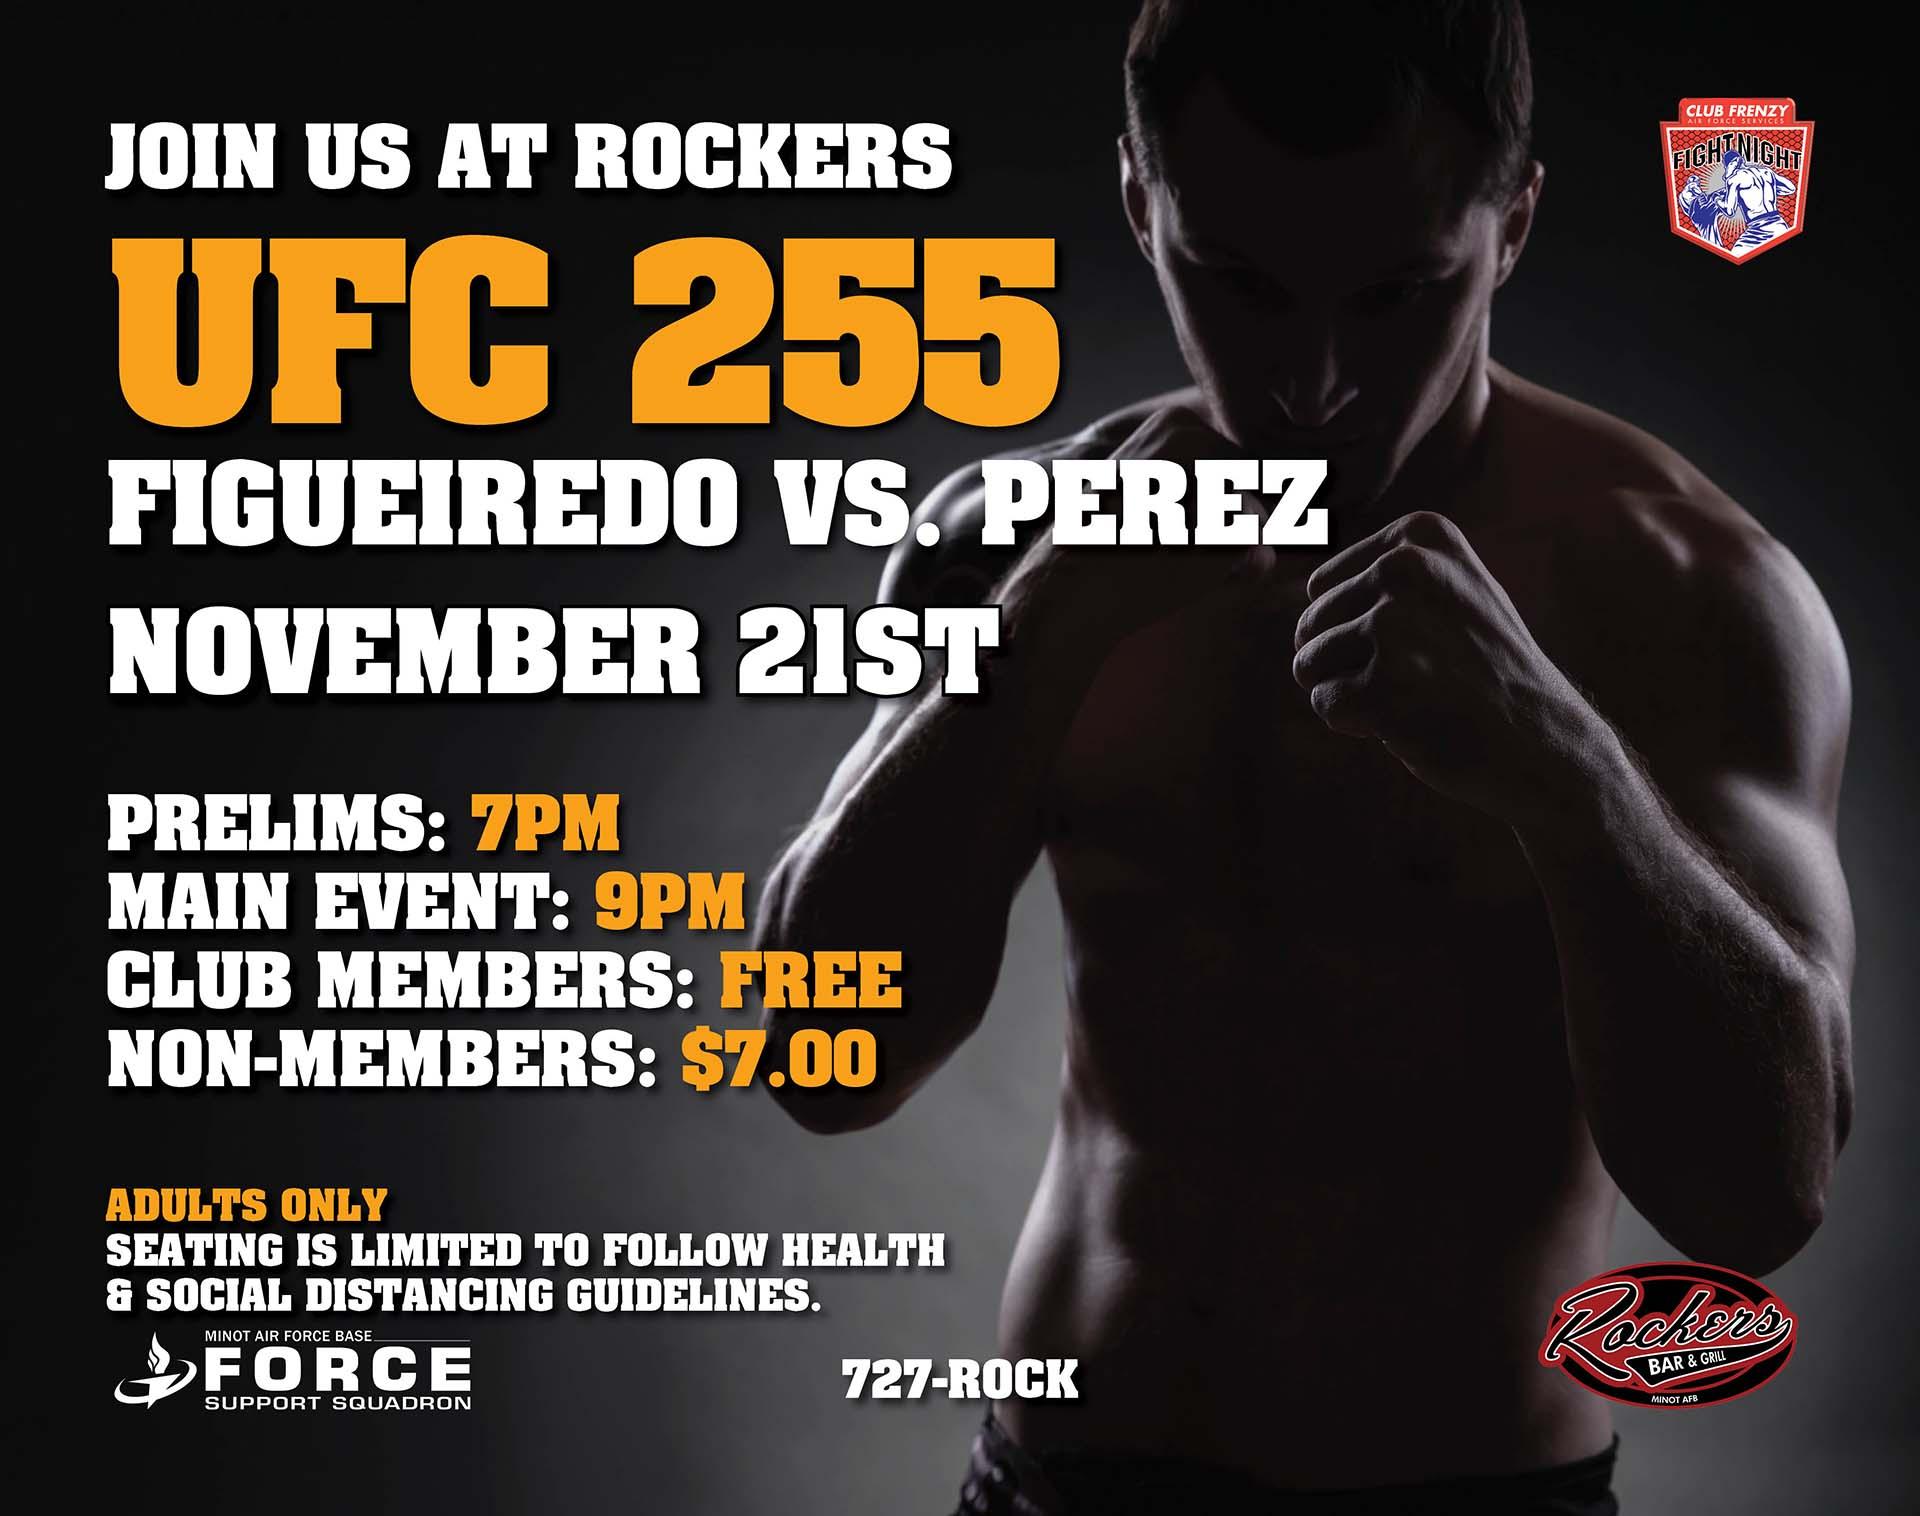 UFC 255: Figueiredo vs Perez - Cancelled